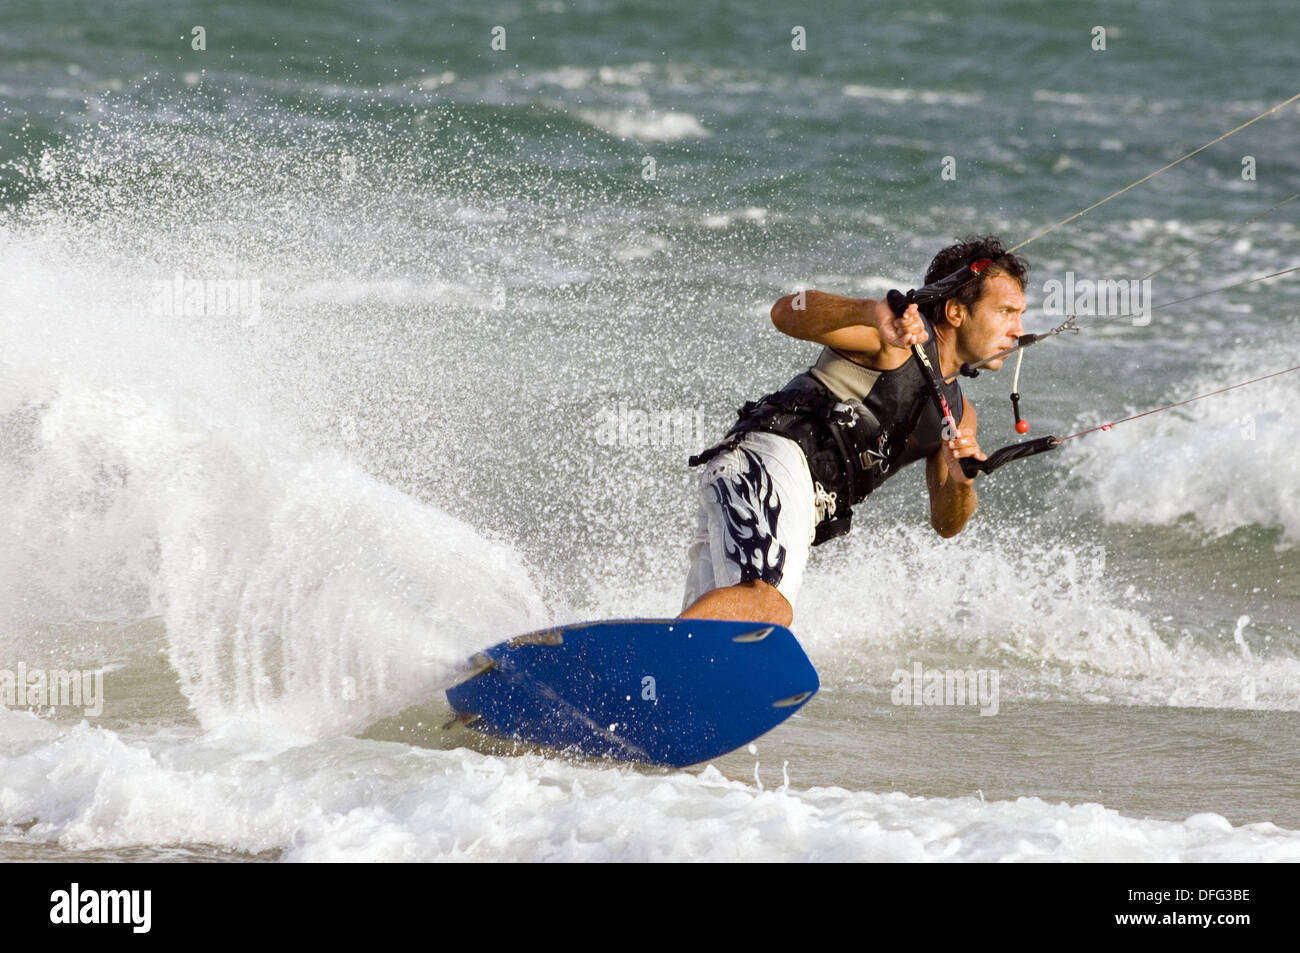 Kiteboarding - Stock Image